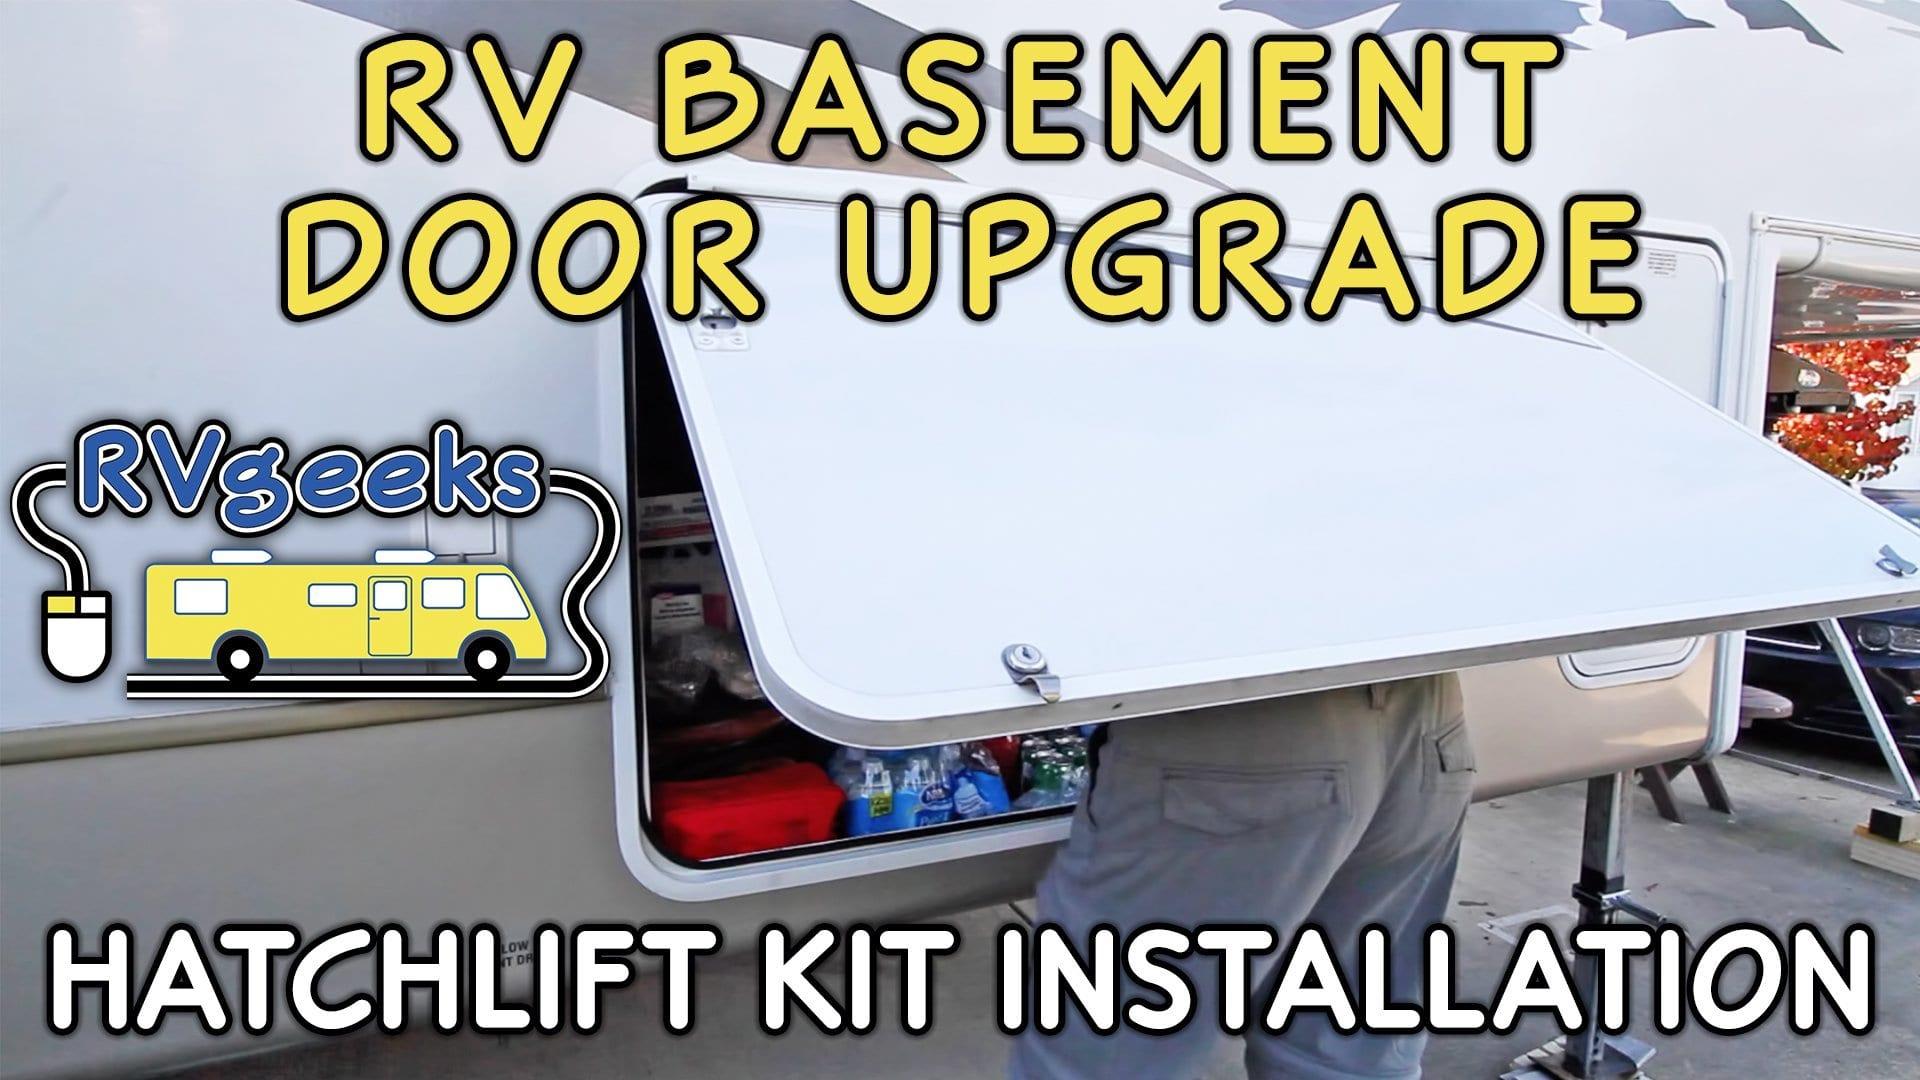 Hatchlift RV Basement Door Lift Kit Installation